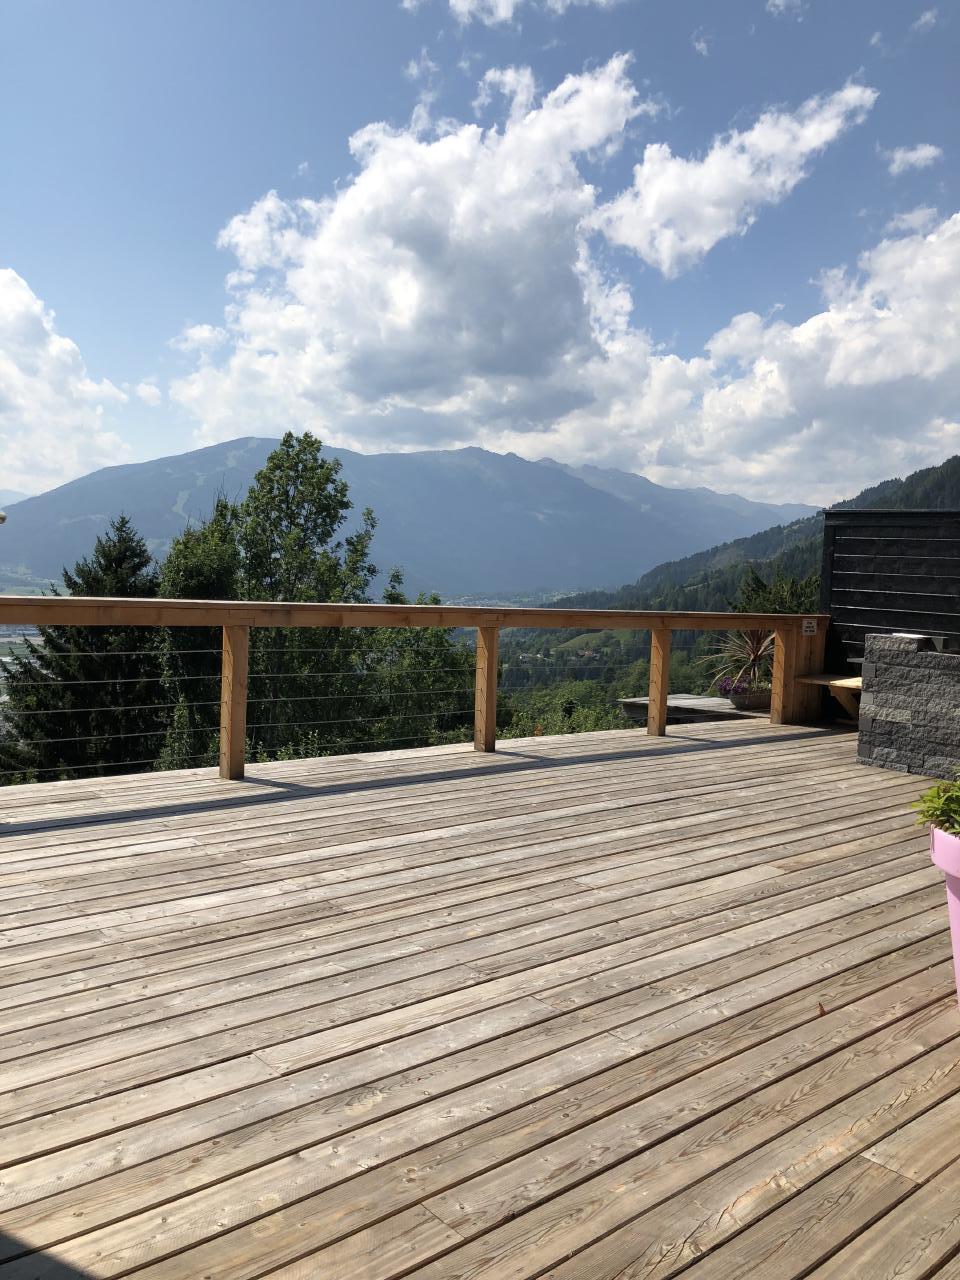 Maison de vacances Landhaus Osttirol (2299545), Dölsach, Osttirol, Tyrol, Autriche, image 32